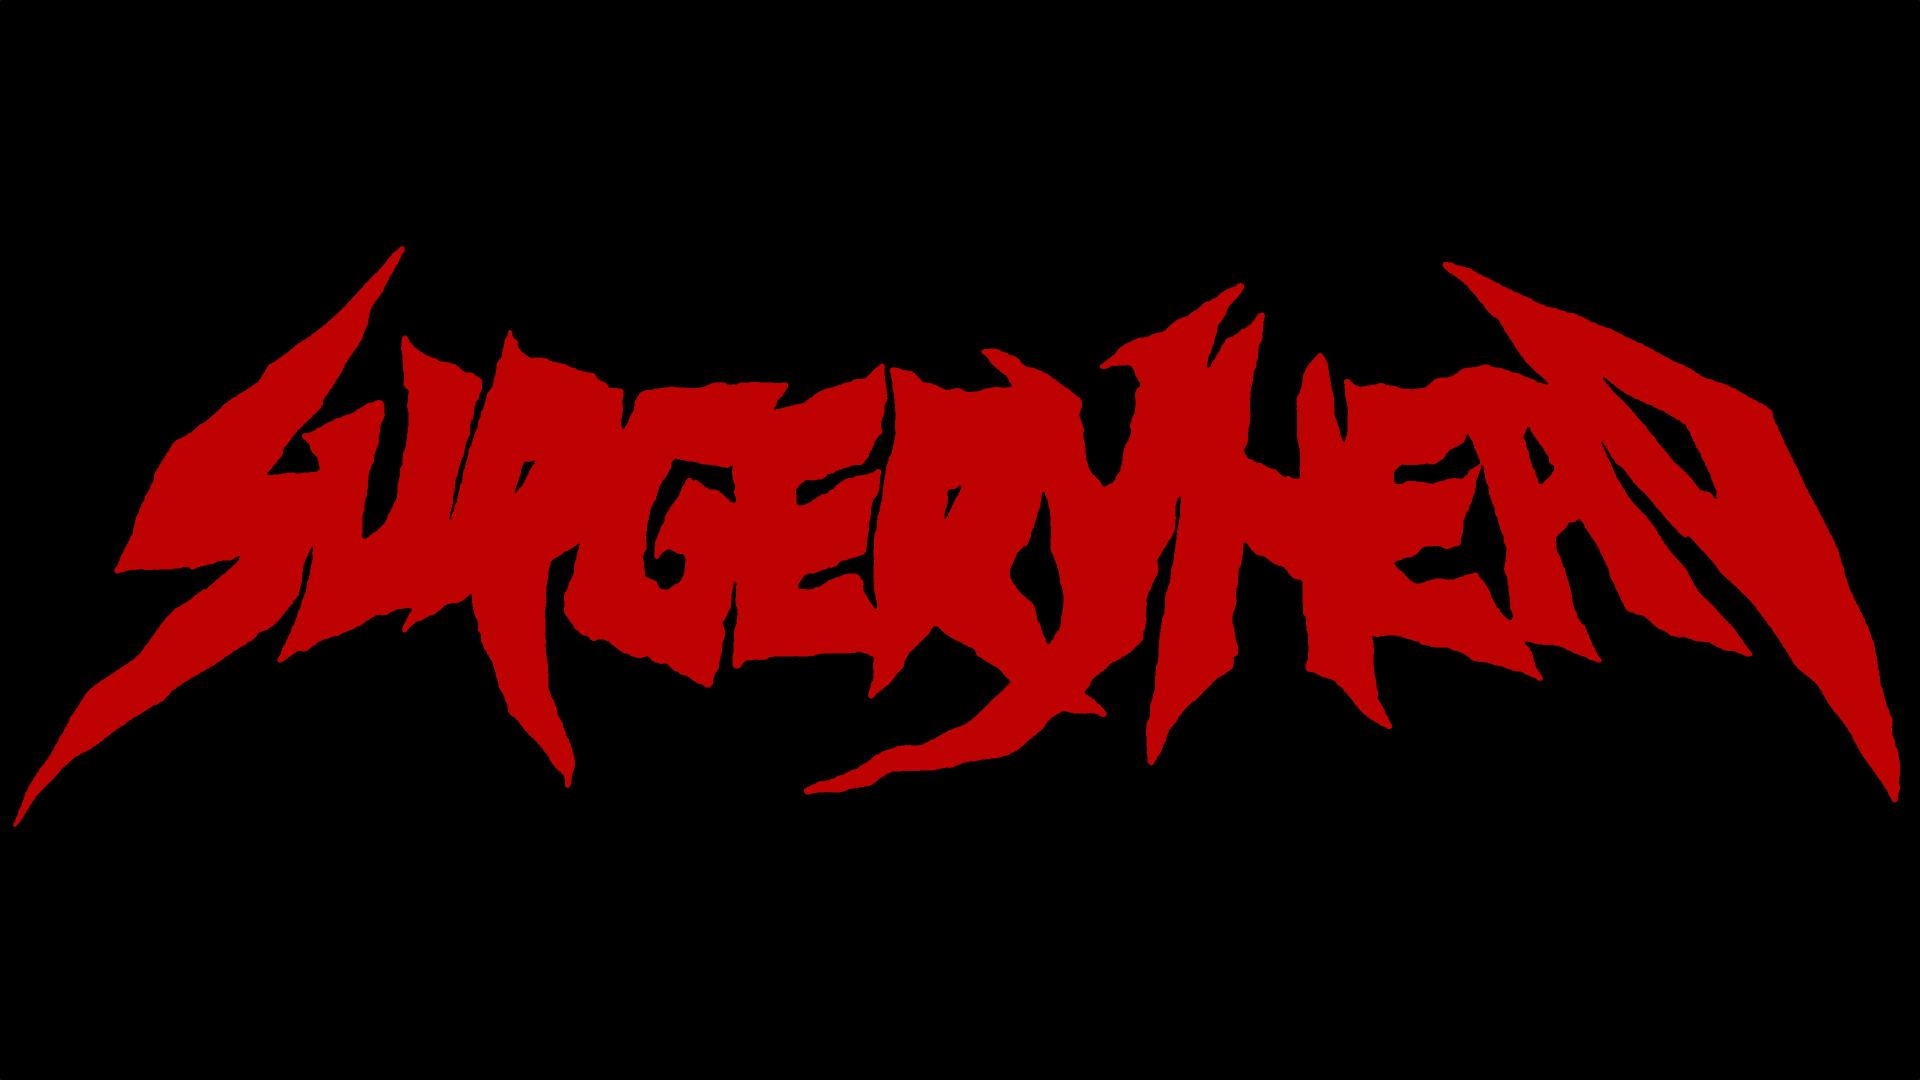 SurgeryHead_Logo_1920-1080 (1).PNG